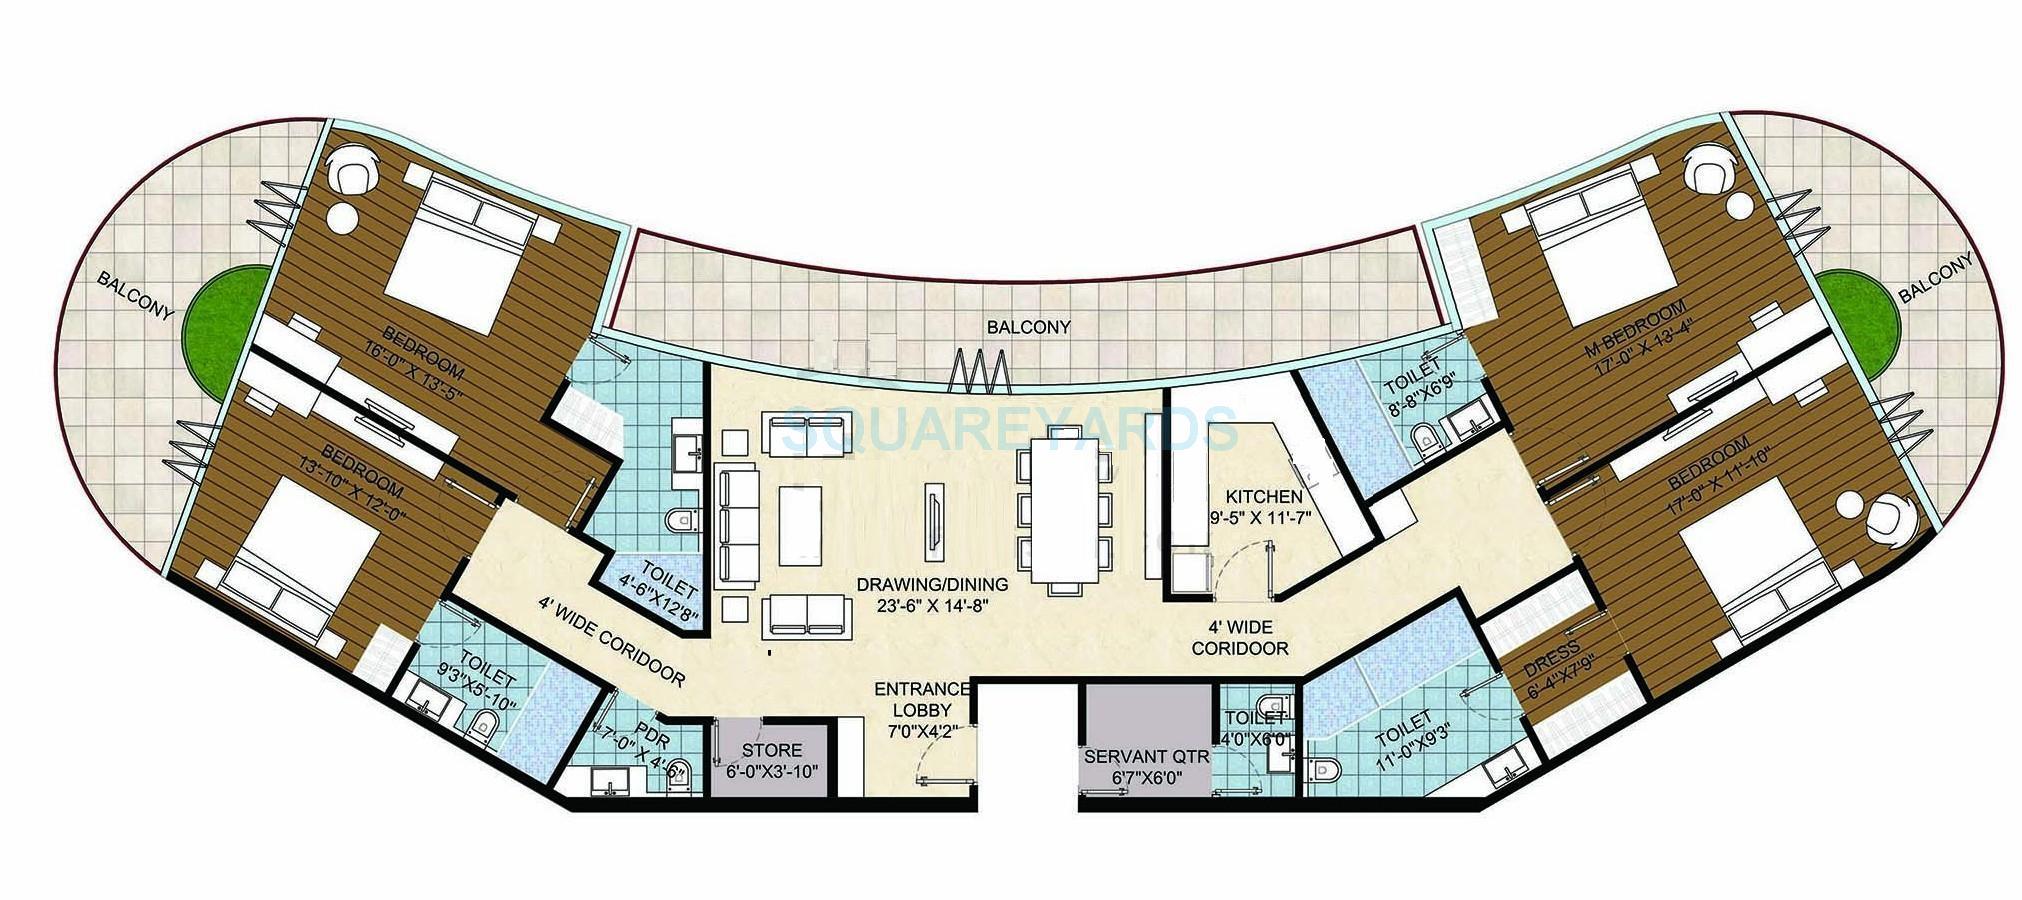 homestead maria sharapova tower apartment 4bhk sq 4t 3650sqft 1